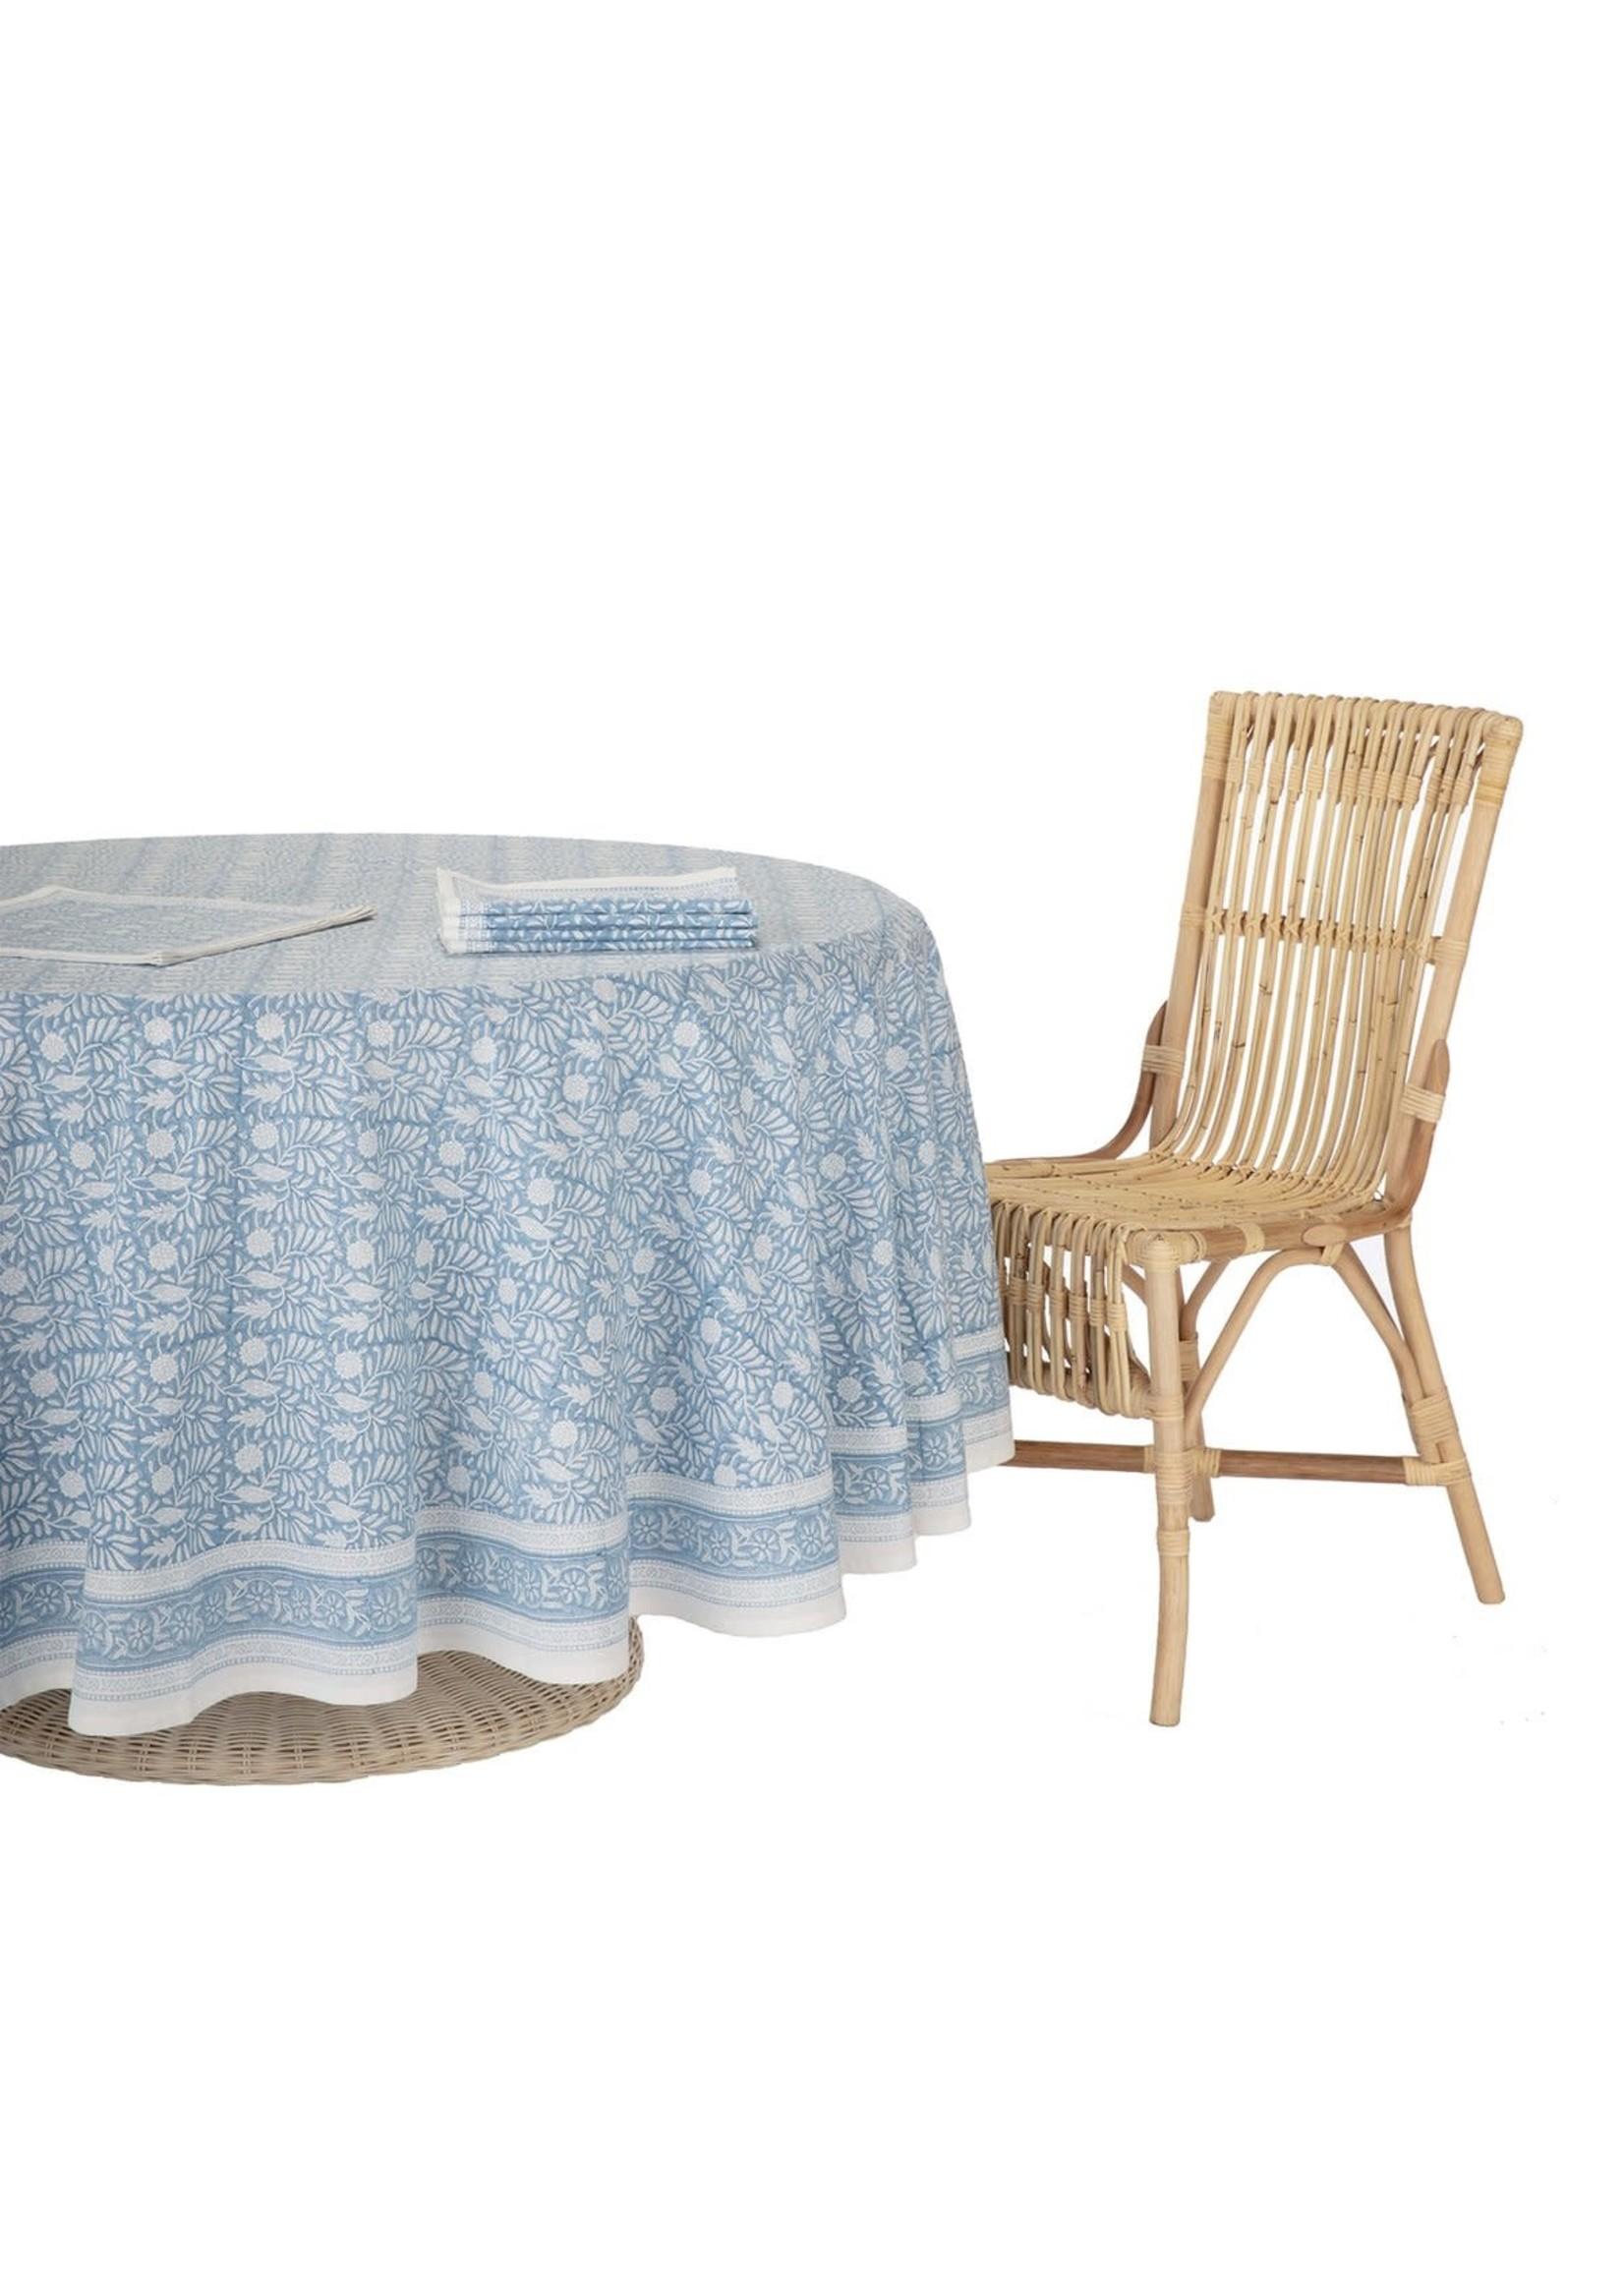 Amanda Lindroth Tablecloth - Jasmine Blue - Round